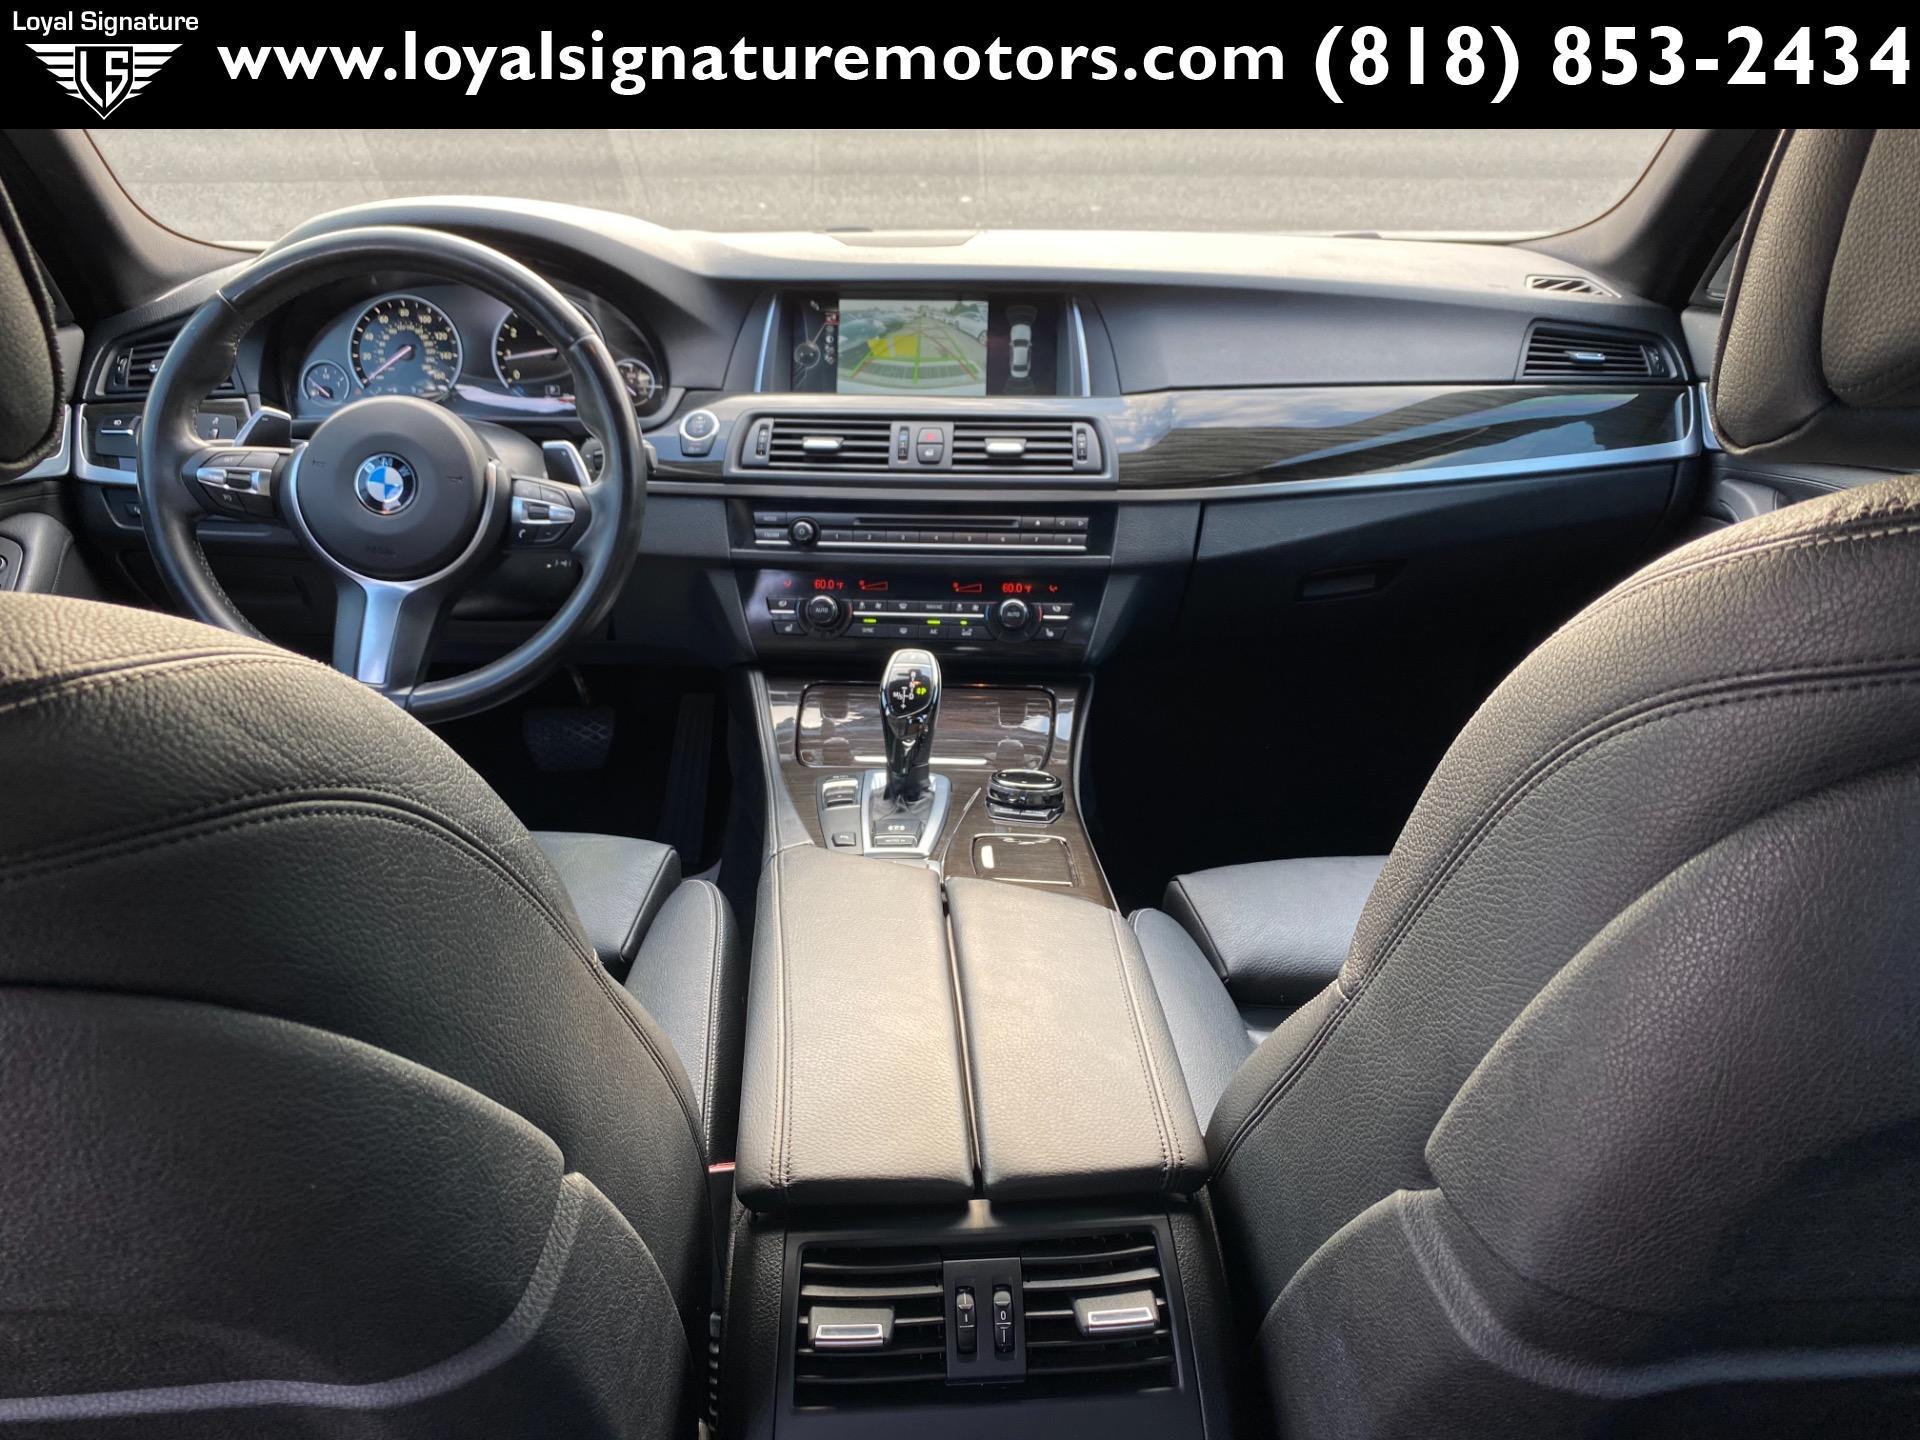 Used-2014-BMW-5-Series-550i